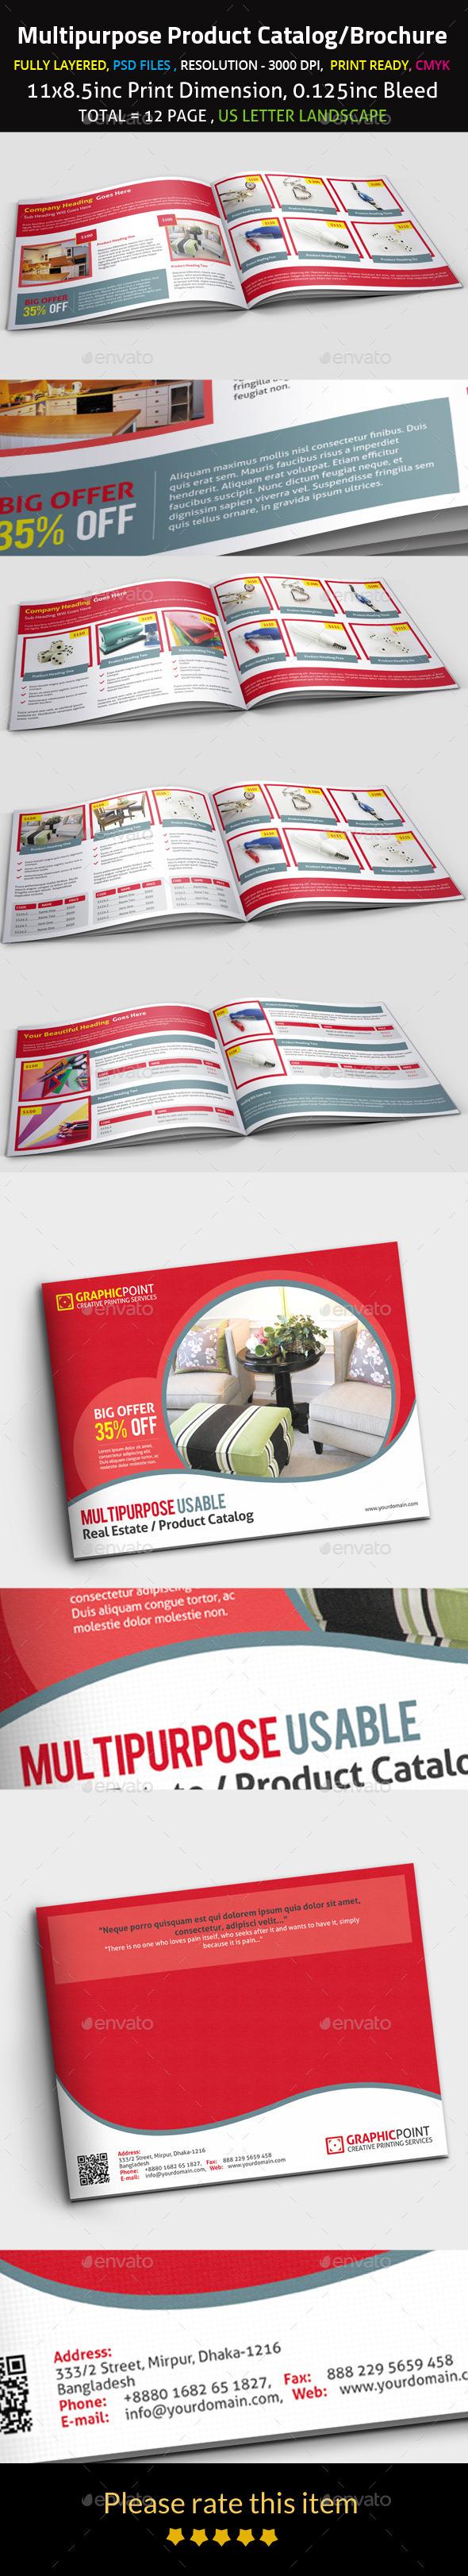 Multipurpose Product Catalog/Brochure - Brochures Print Templates